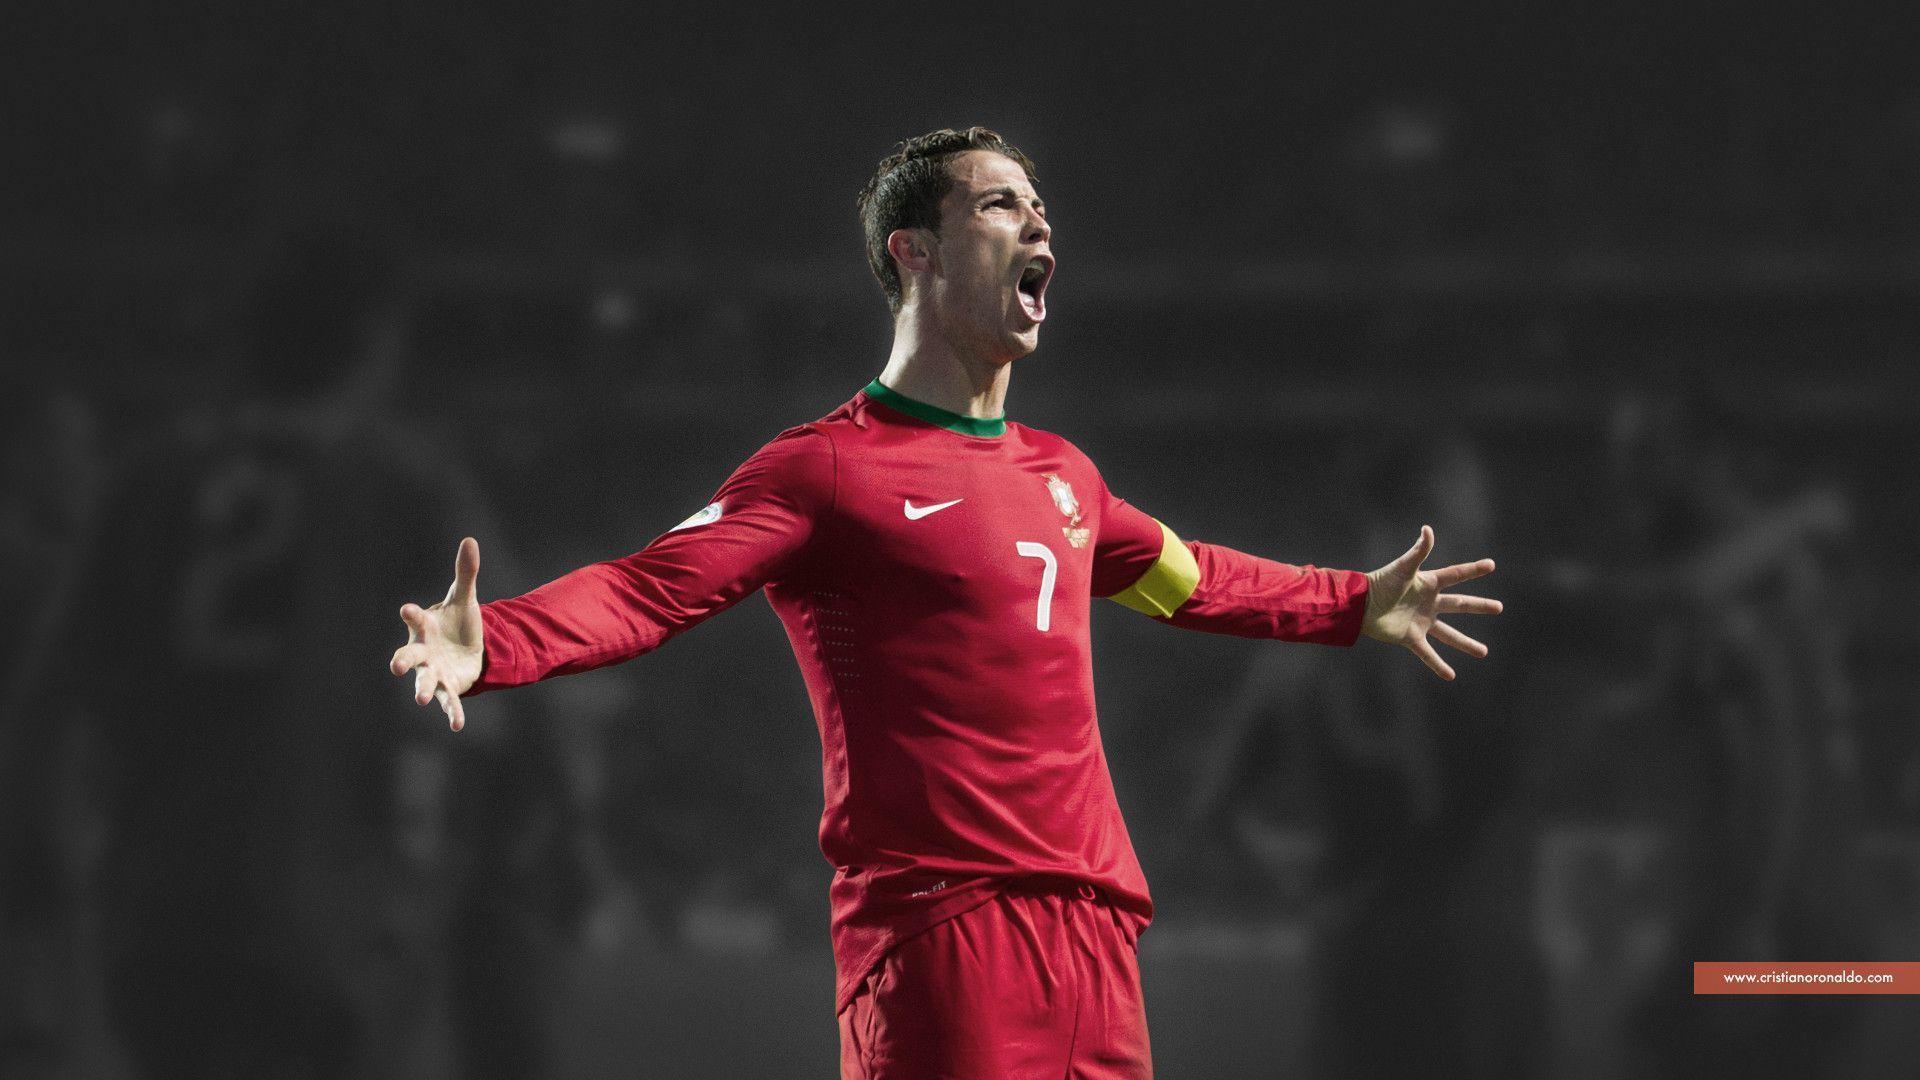 Cristiano Ronaldo 2014 Wallpapers, Full HD Sporteology